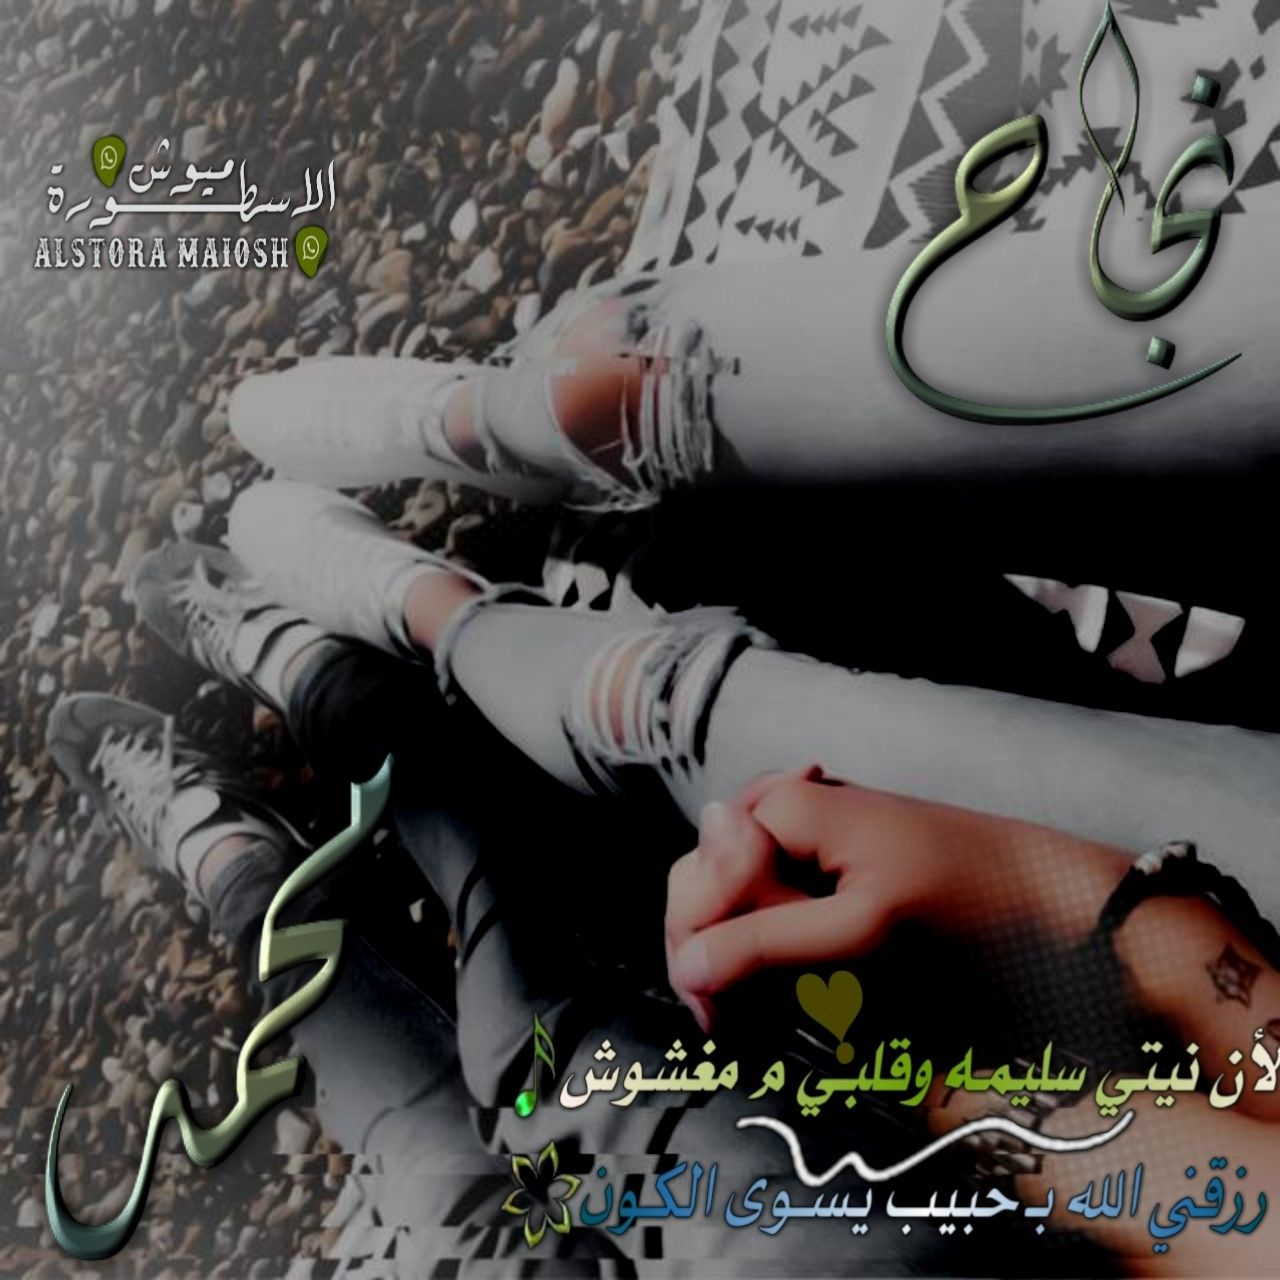 اسم نجاح ومحمد تصميمي Legging Fashion